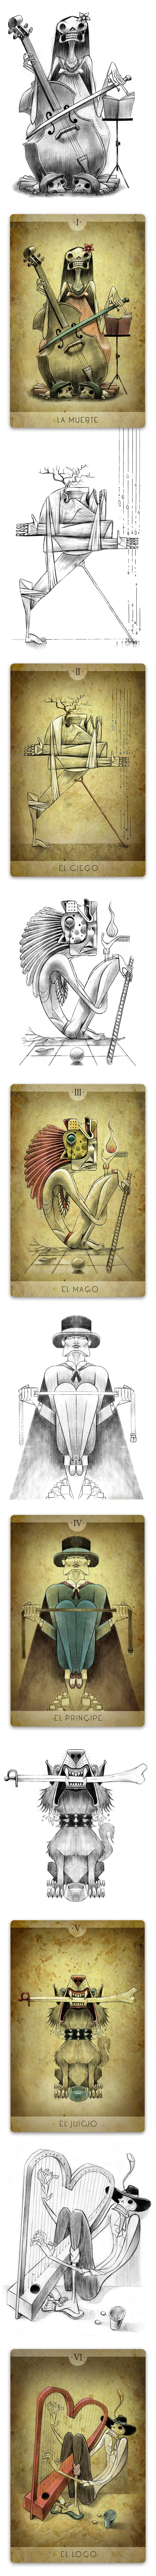 jorge Lewis l'illustrateur du spirituel #2 Tarot Mundano